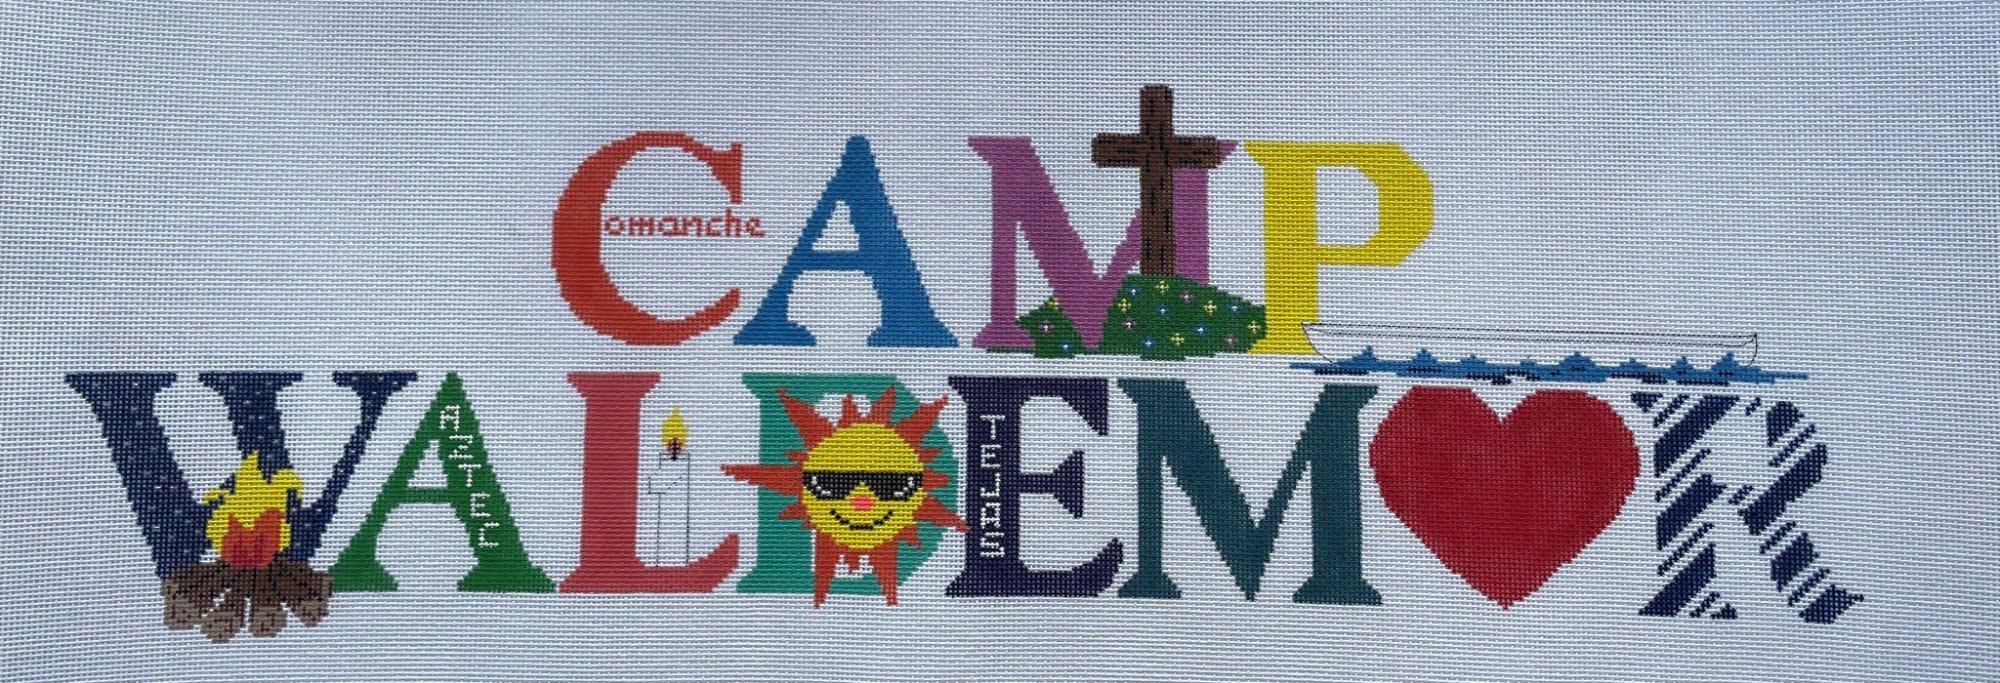 PPD/NGCMP02 Camp Waldemar